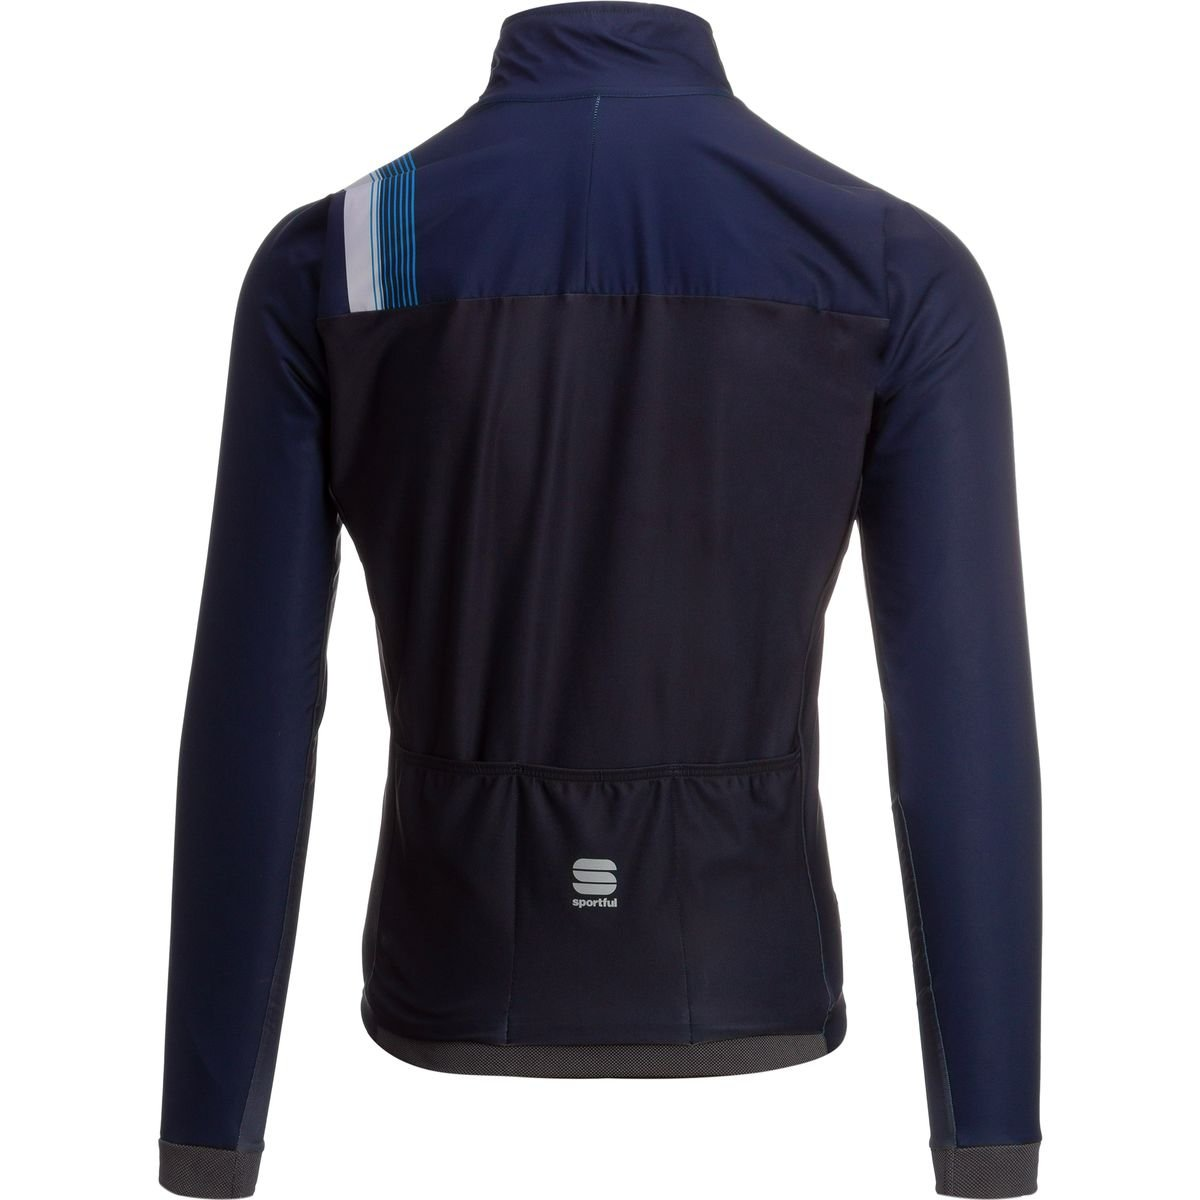 Chaqueta Sportful Bodyfit Pro Thermal Negro-Azul 2017 ...